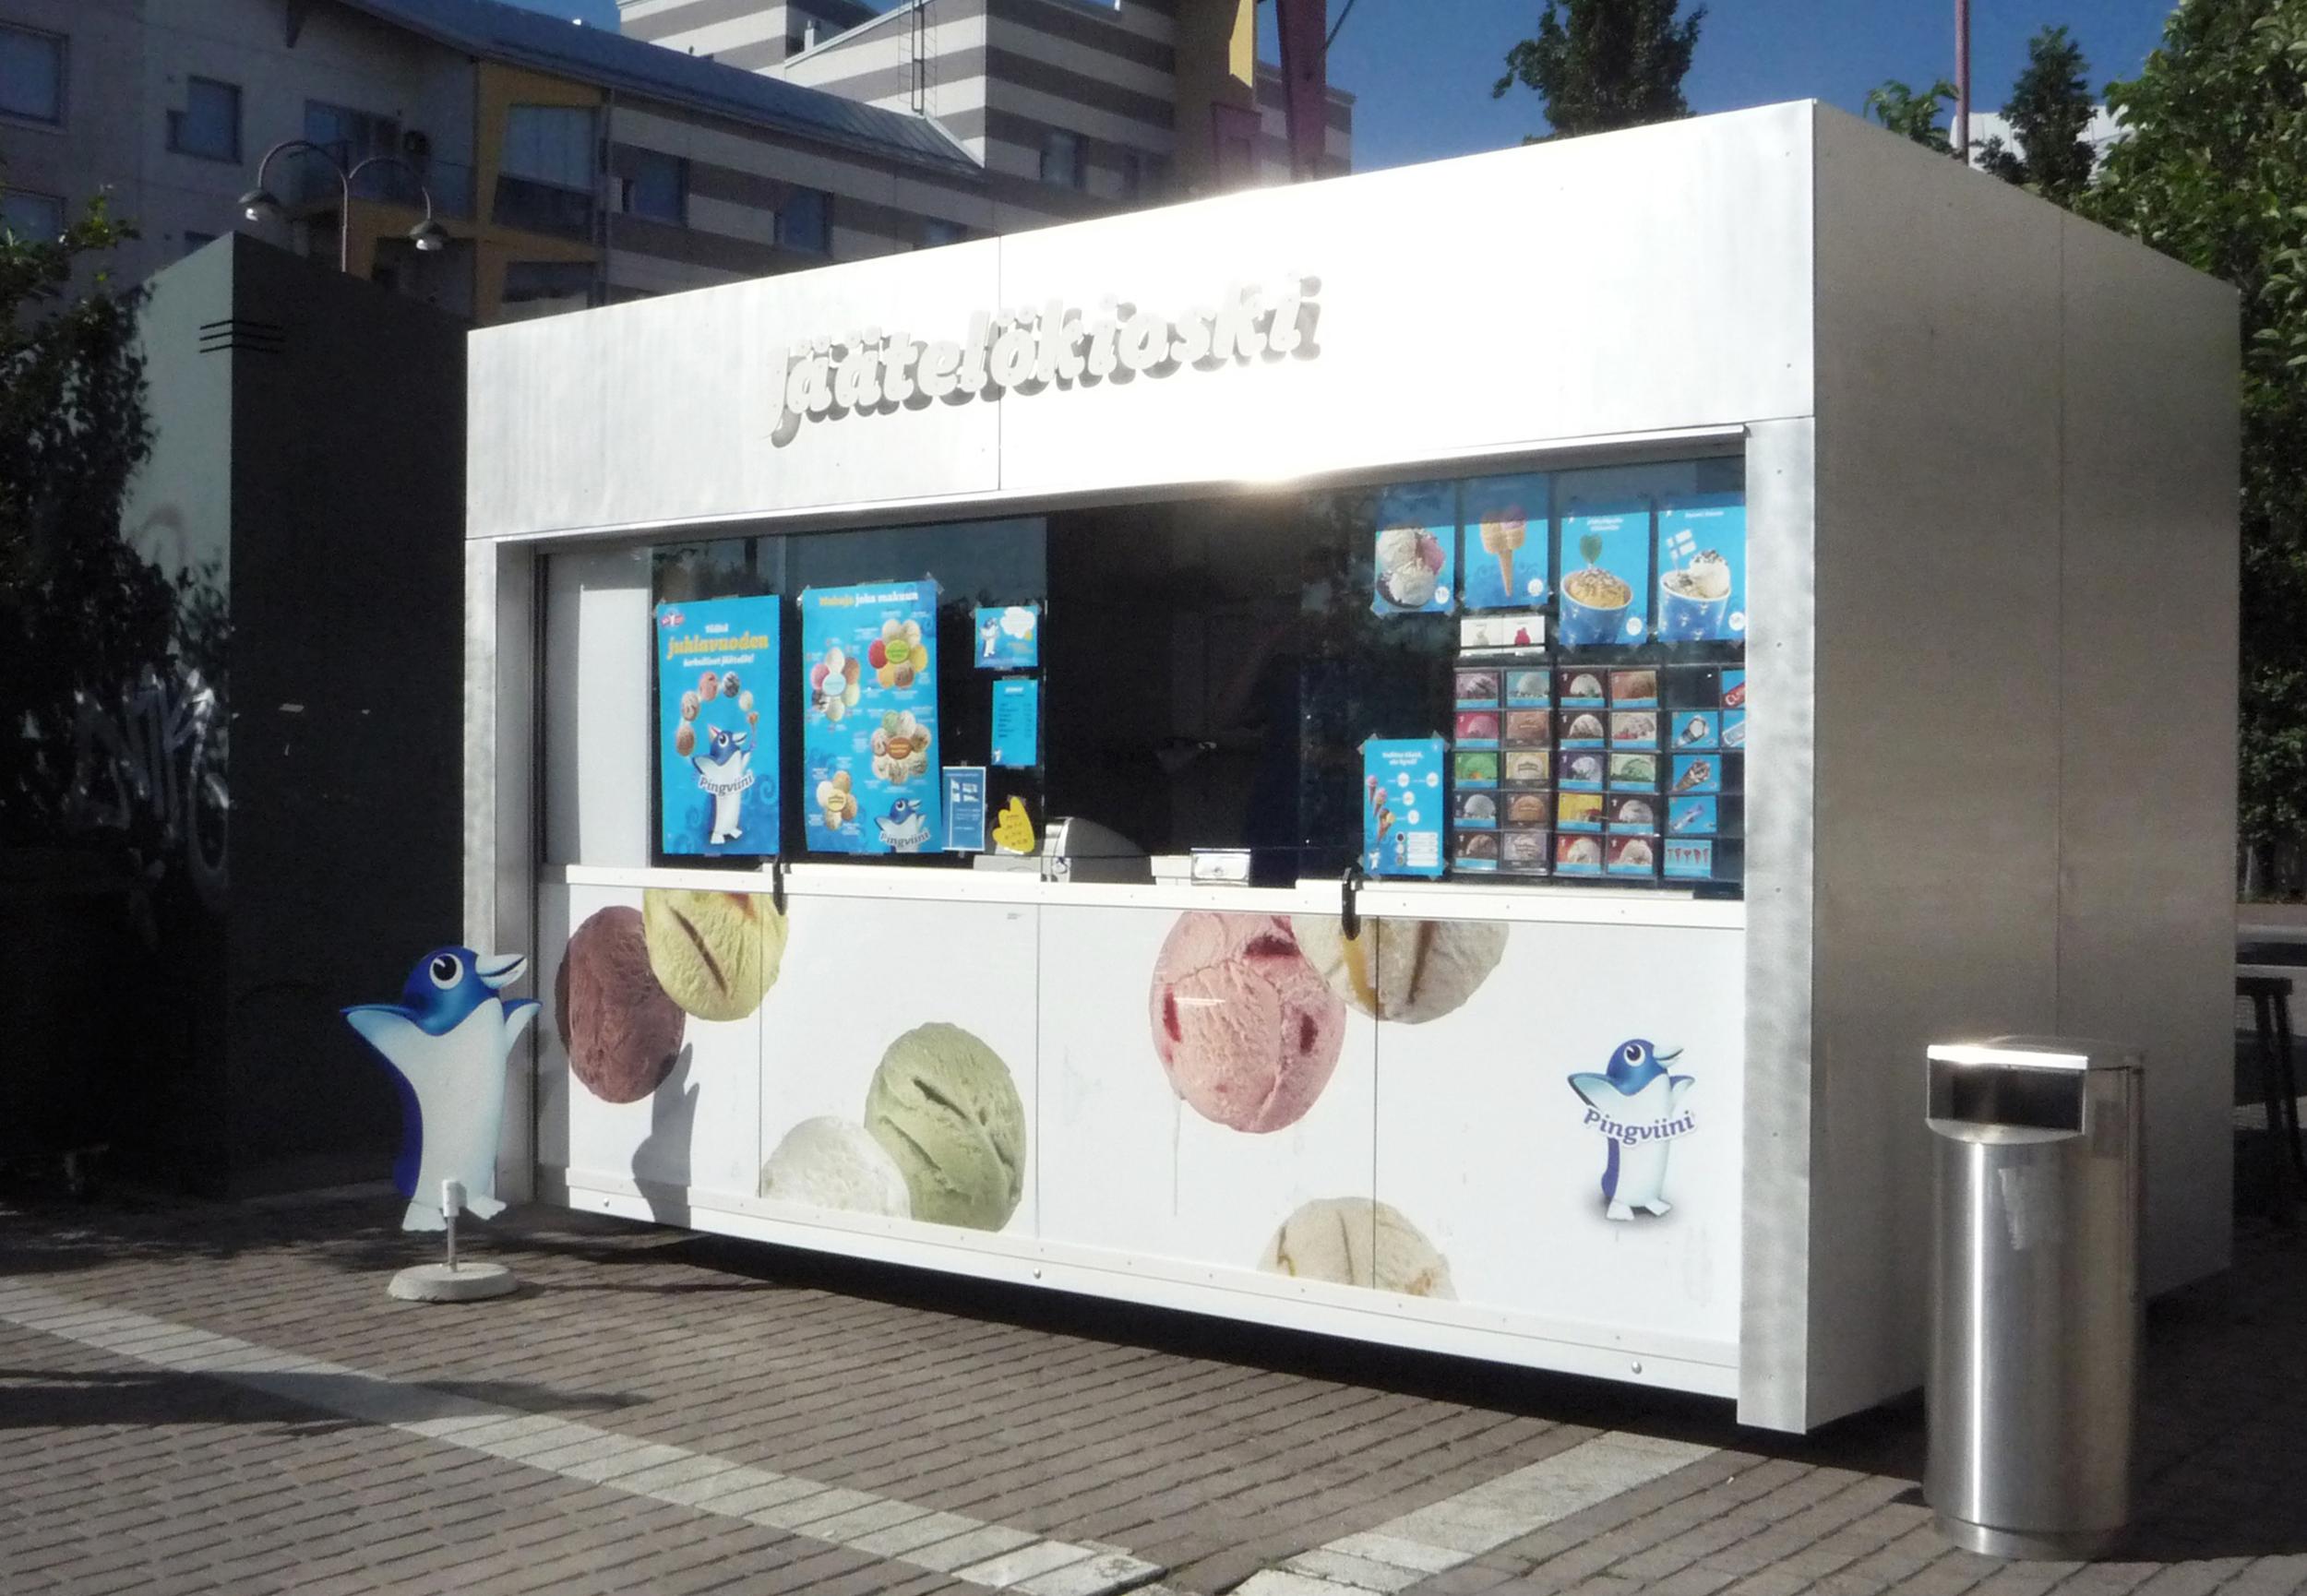 Katariina Sewón: ice-cream kiosk for  Nestlé Finland, 2012